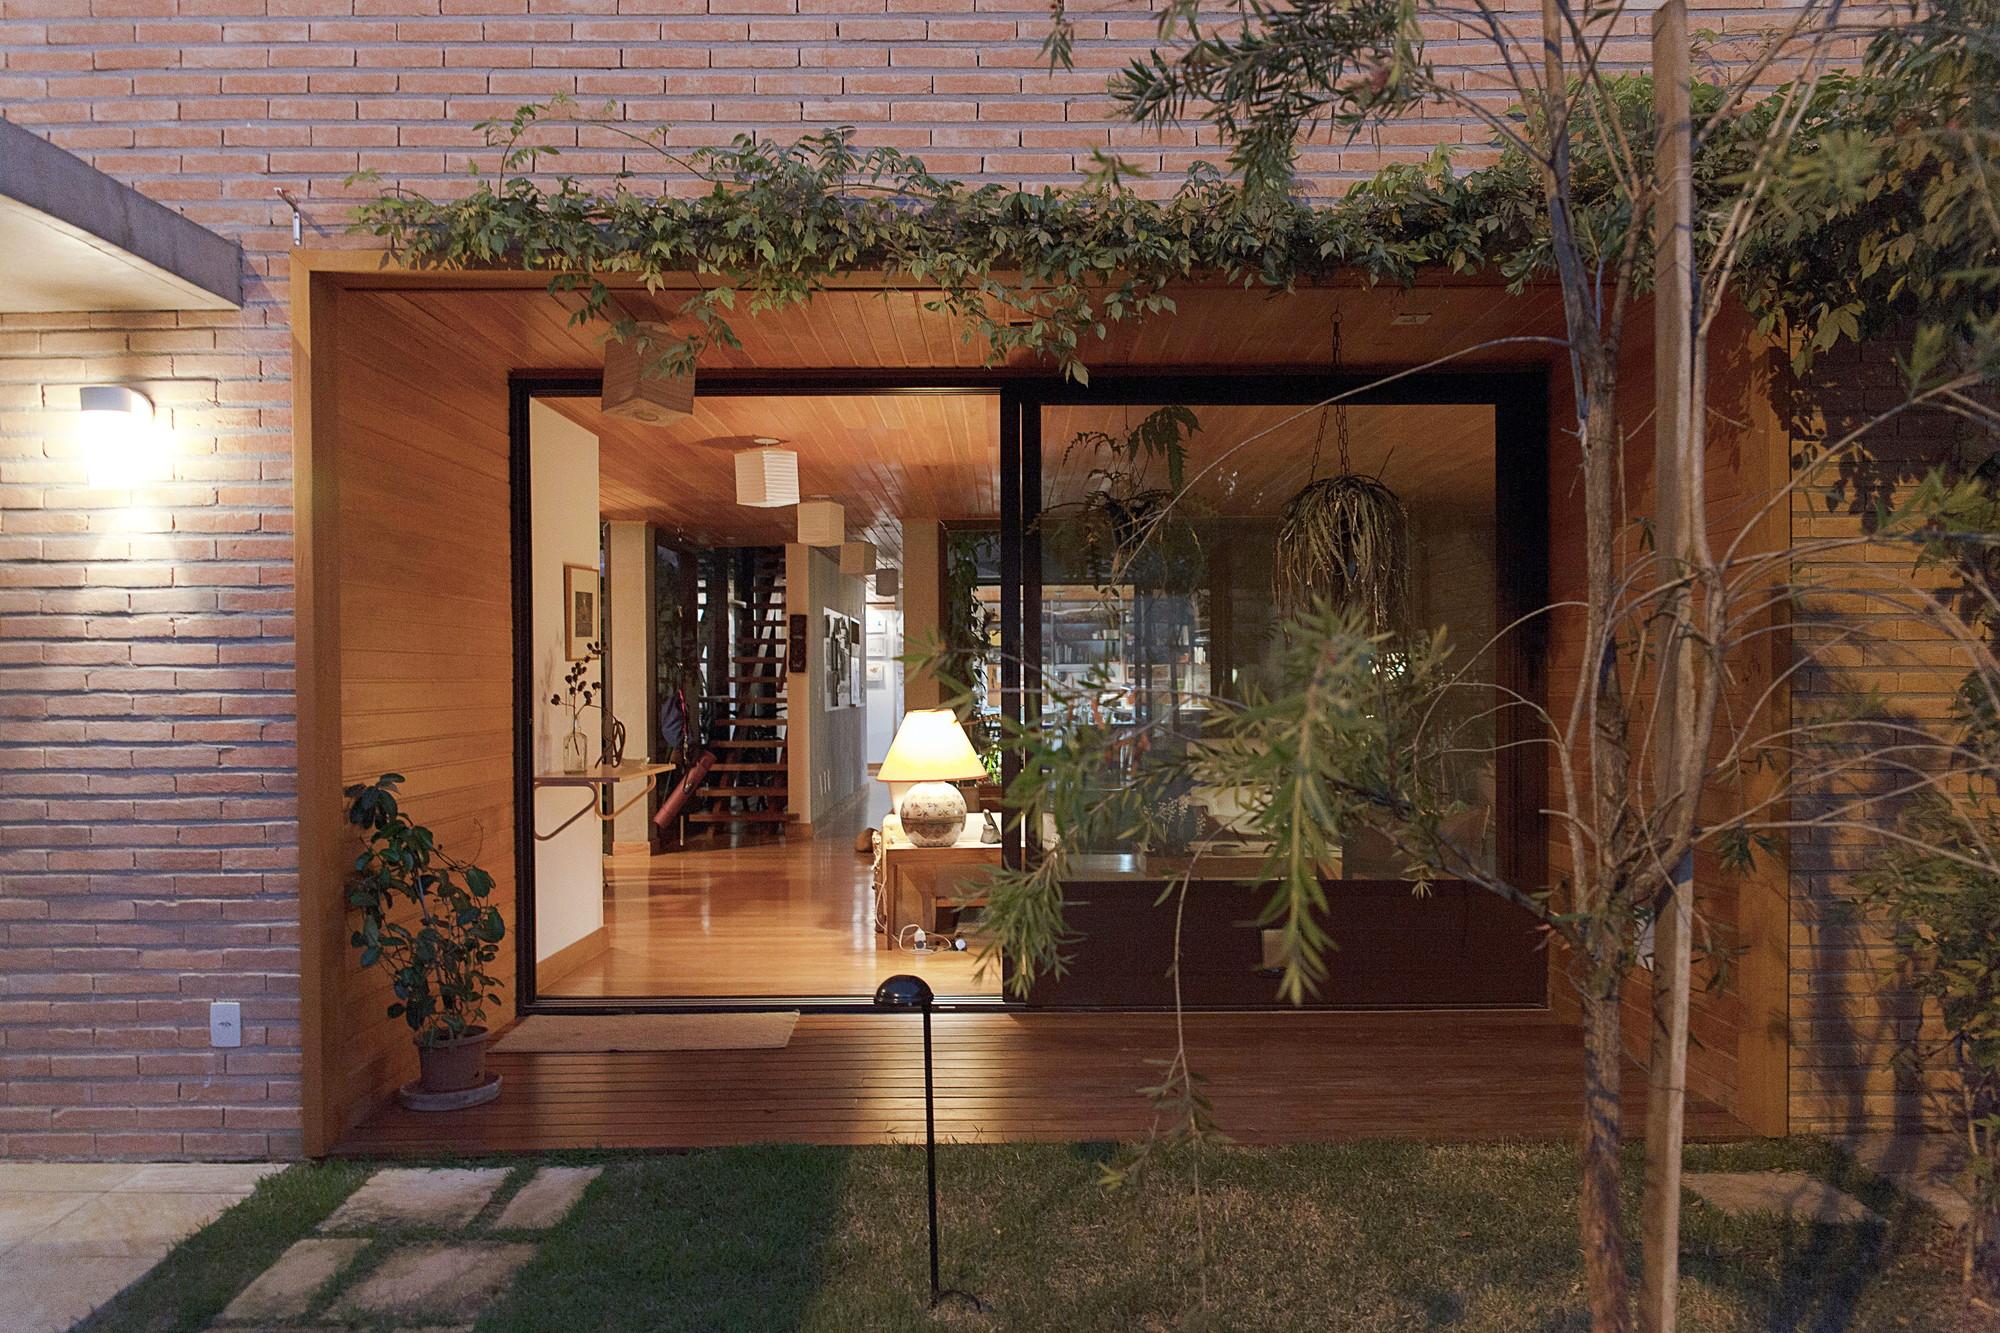 Galeria de casa 10x10 oficina de arquitetura 14 Carrelage 10 x 10